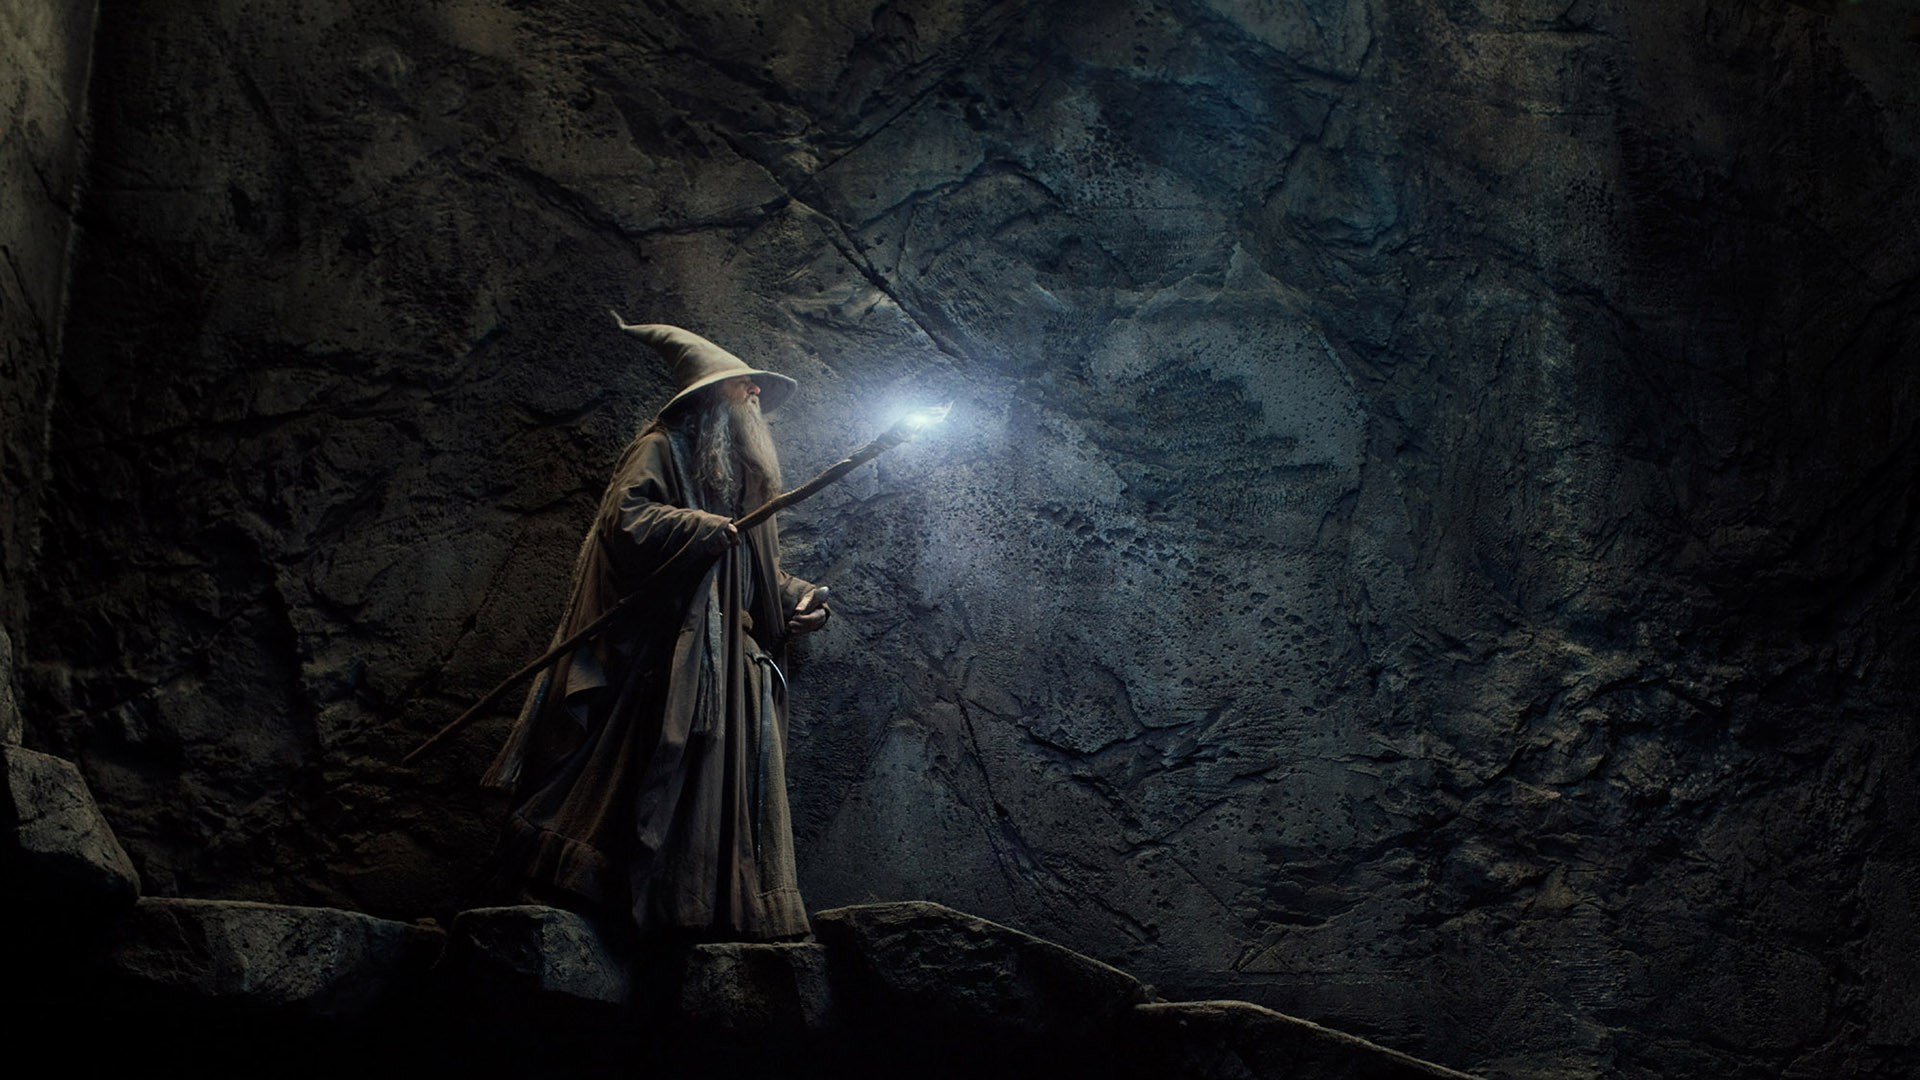 pustkowie smauga - gandalf